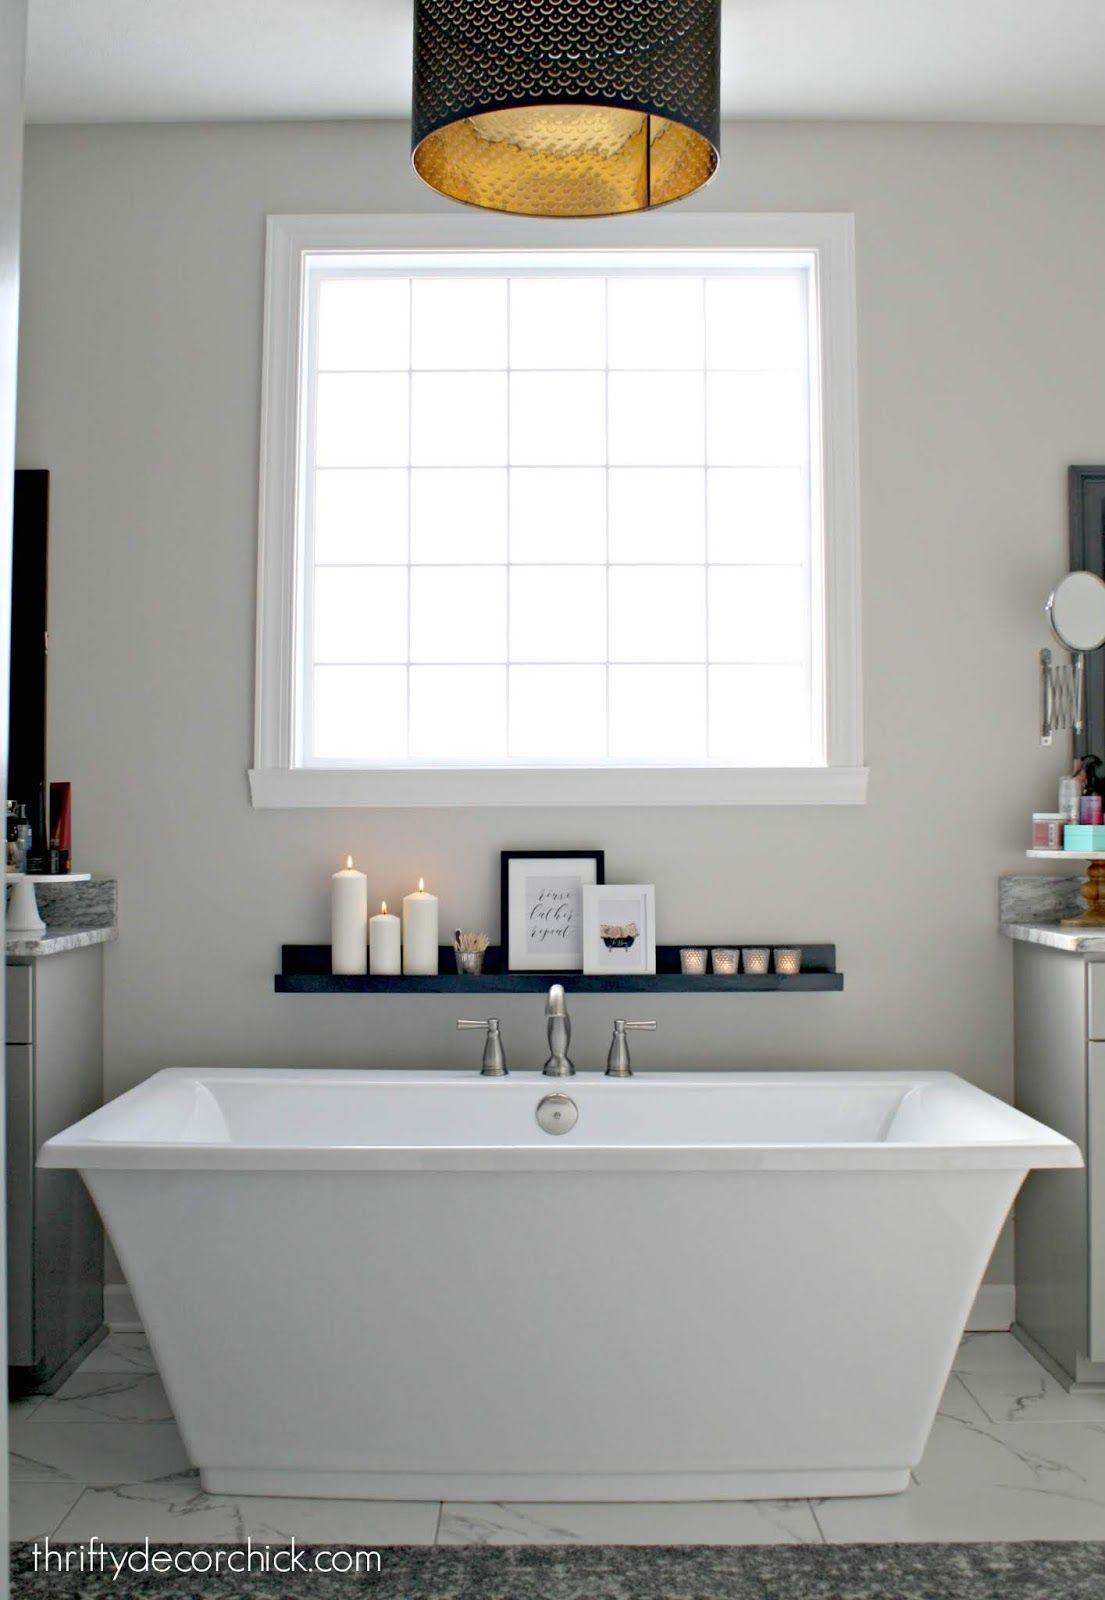 DIY display ledge for spa feel in the bathroom  Simple bathroom